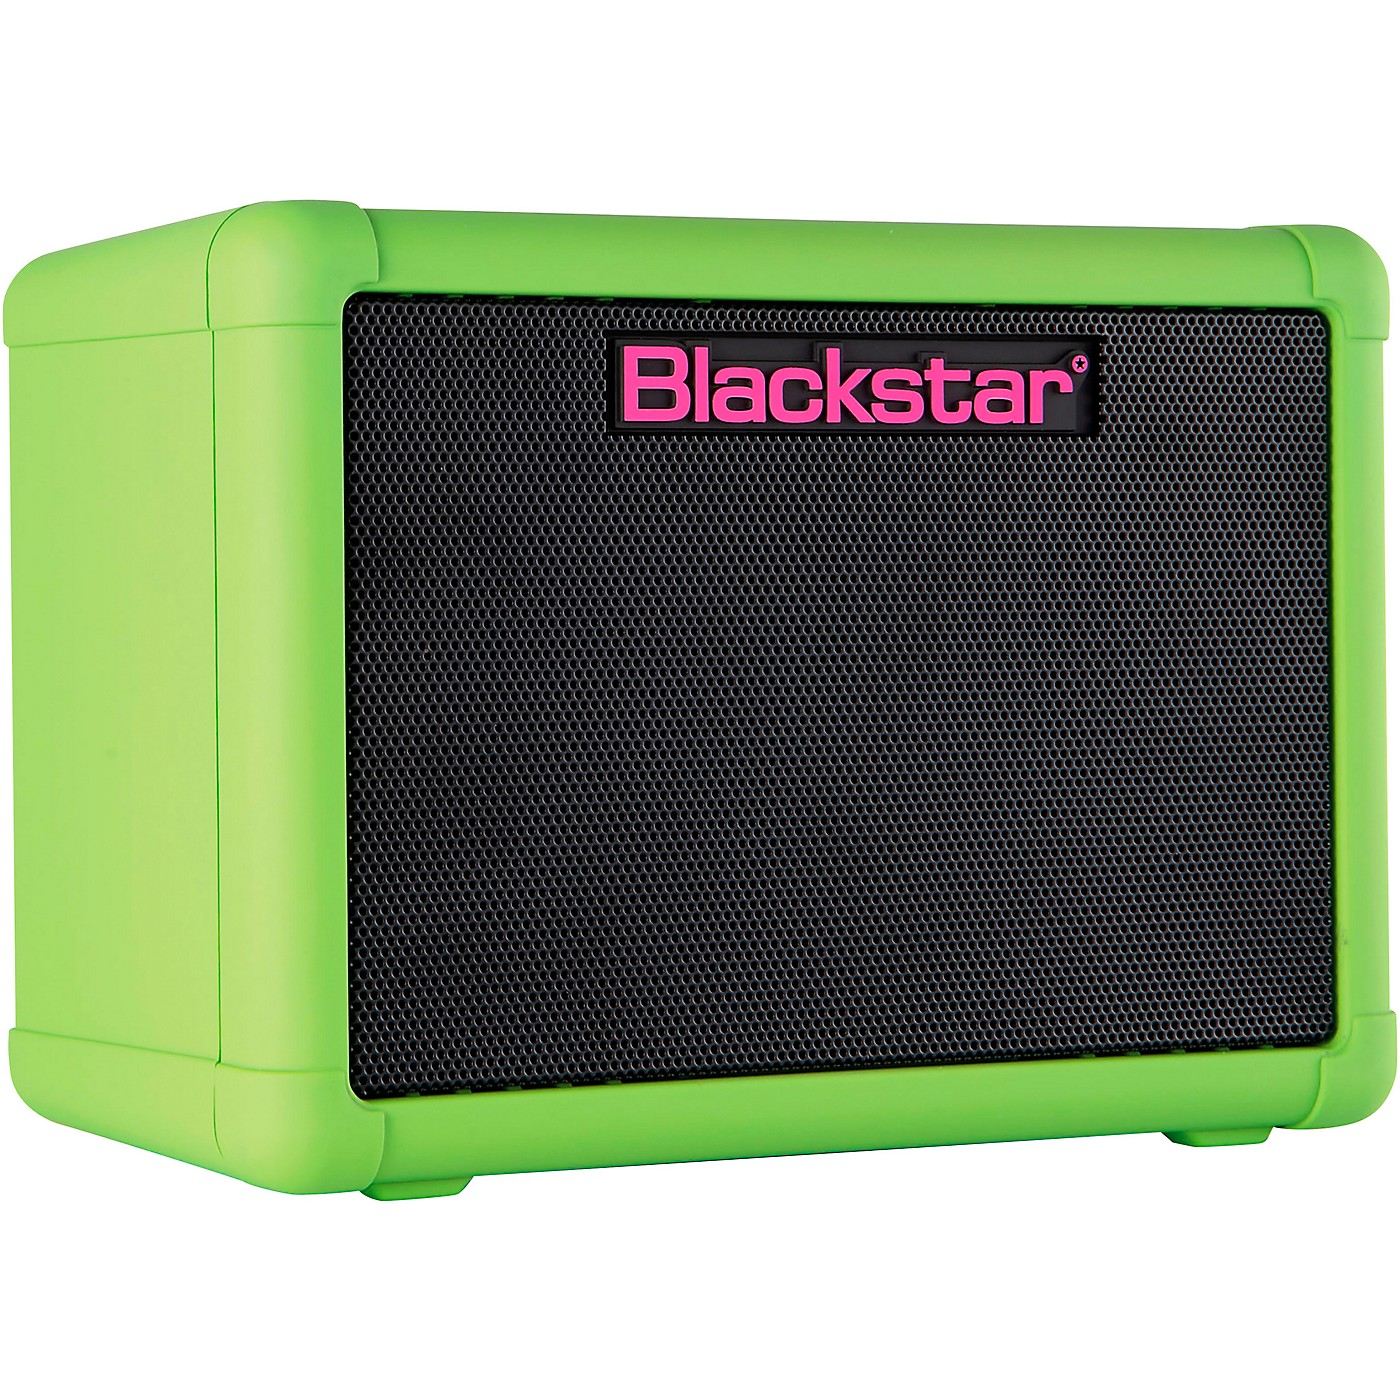 Blackstar FLY3 Neon thumbnail